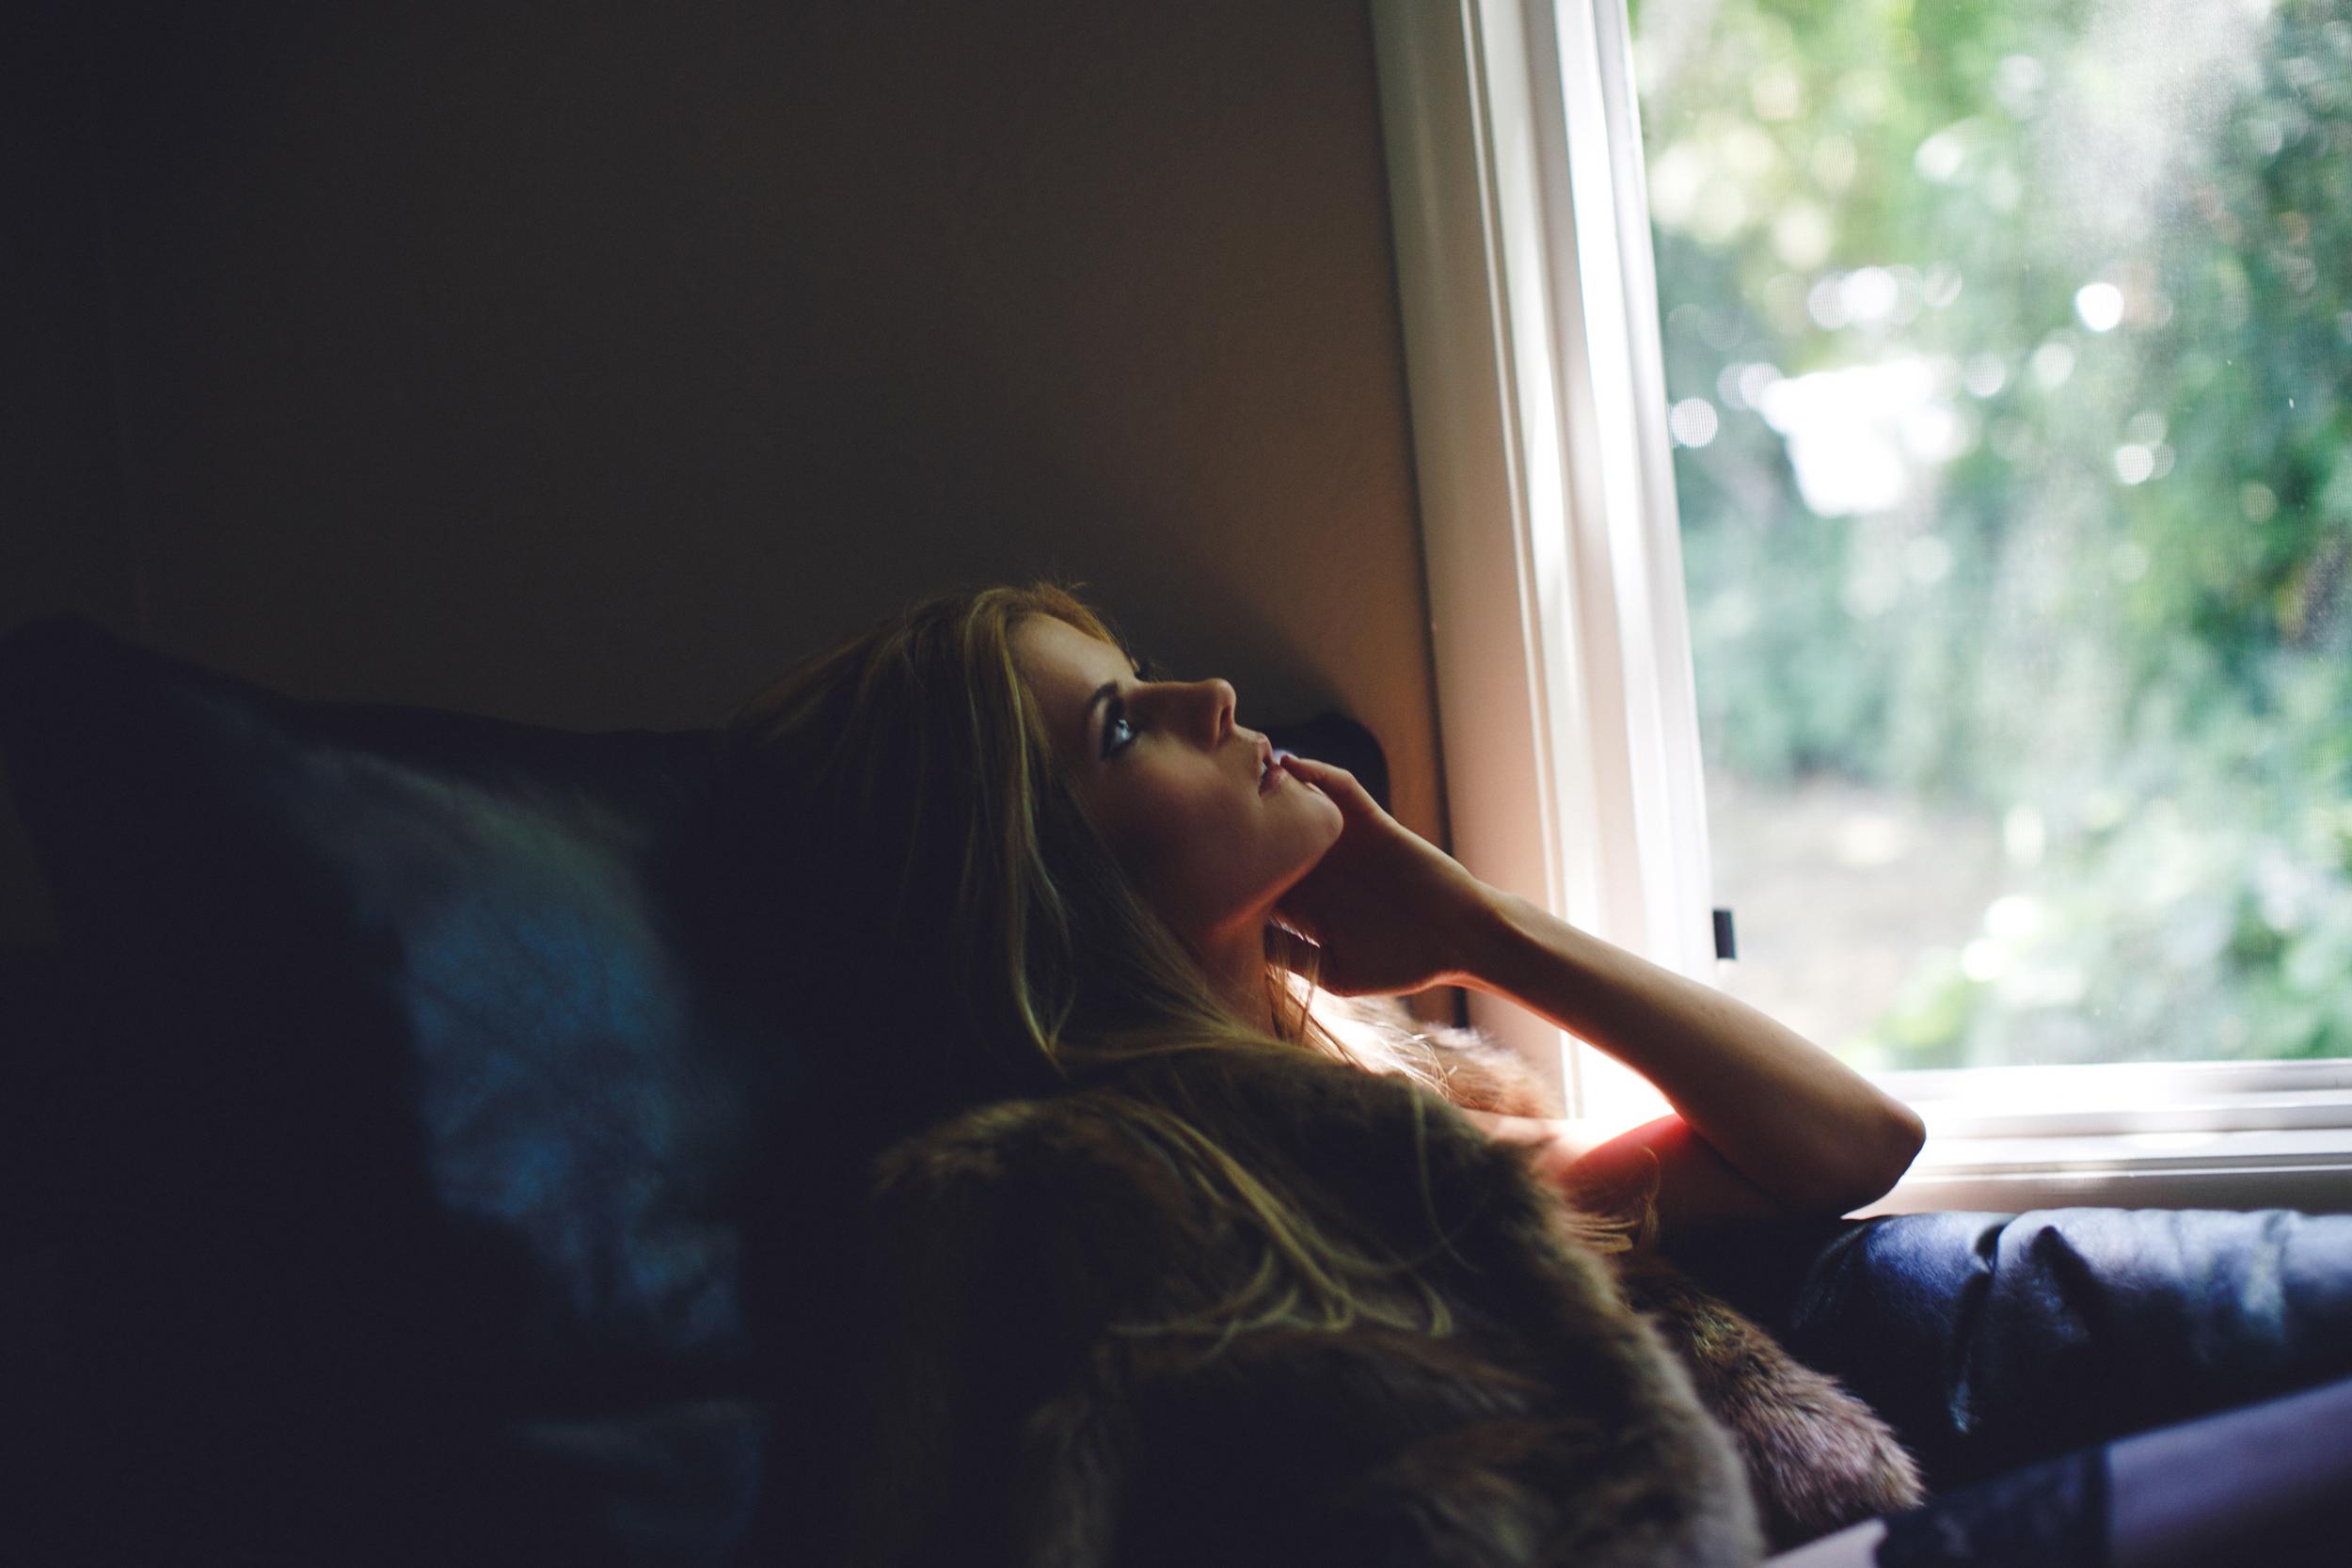 Inspired by fashion and raw expression, Jennifer Skog's boudoir photography evokes realism, seduction and the unexpected. Available Worldwide.  www.jenniferskogboudoir.com